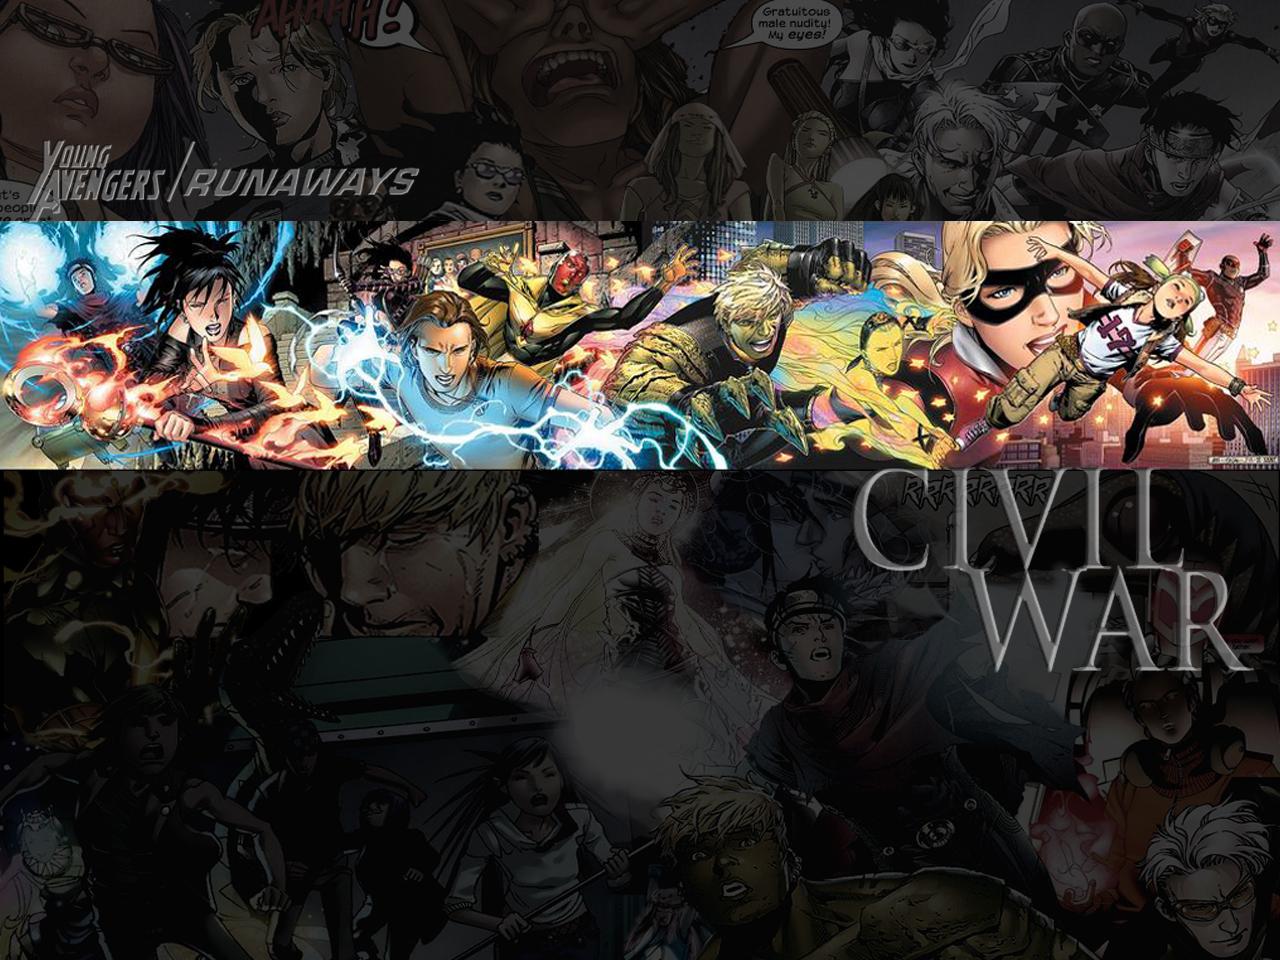 Download Wallpaper Marvel Runaways - runaways_young_avengers_cw_by_spideyboy1111  Image_403310.jpg